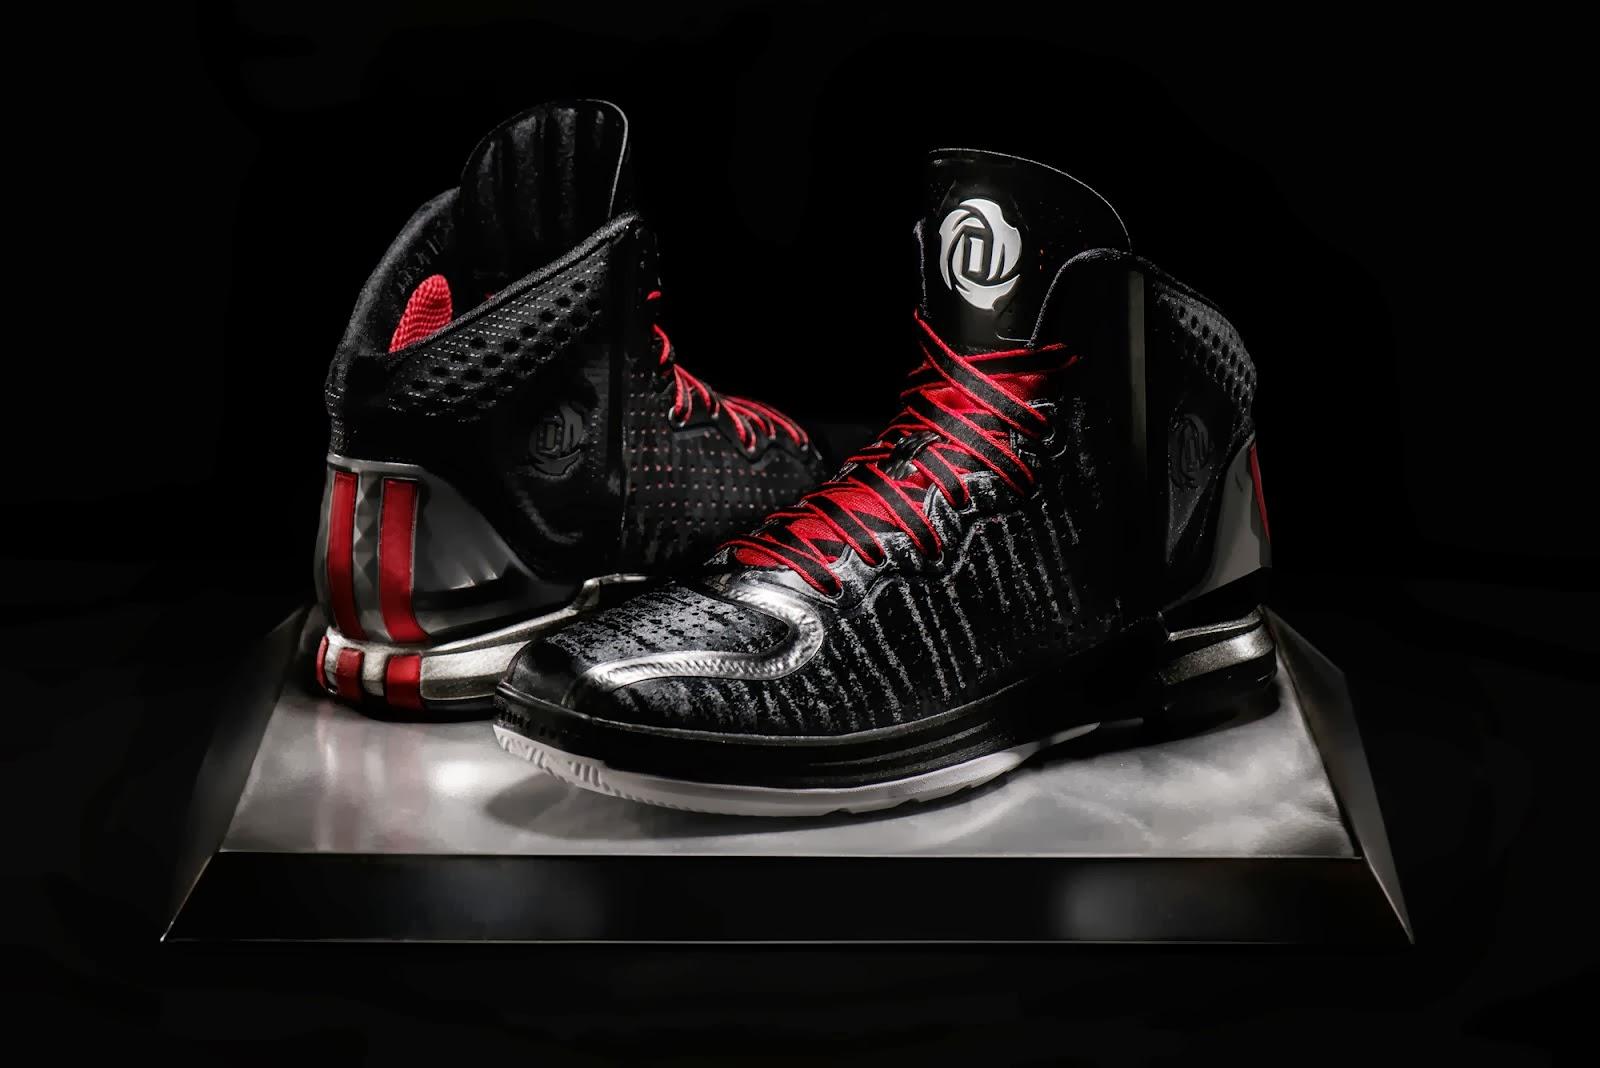 ff86e70c57ac Adidas Launches New D Rose 4 Signature Shoe. DROSE ...